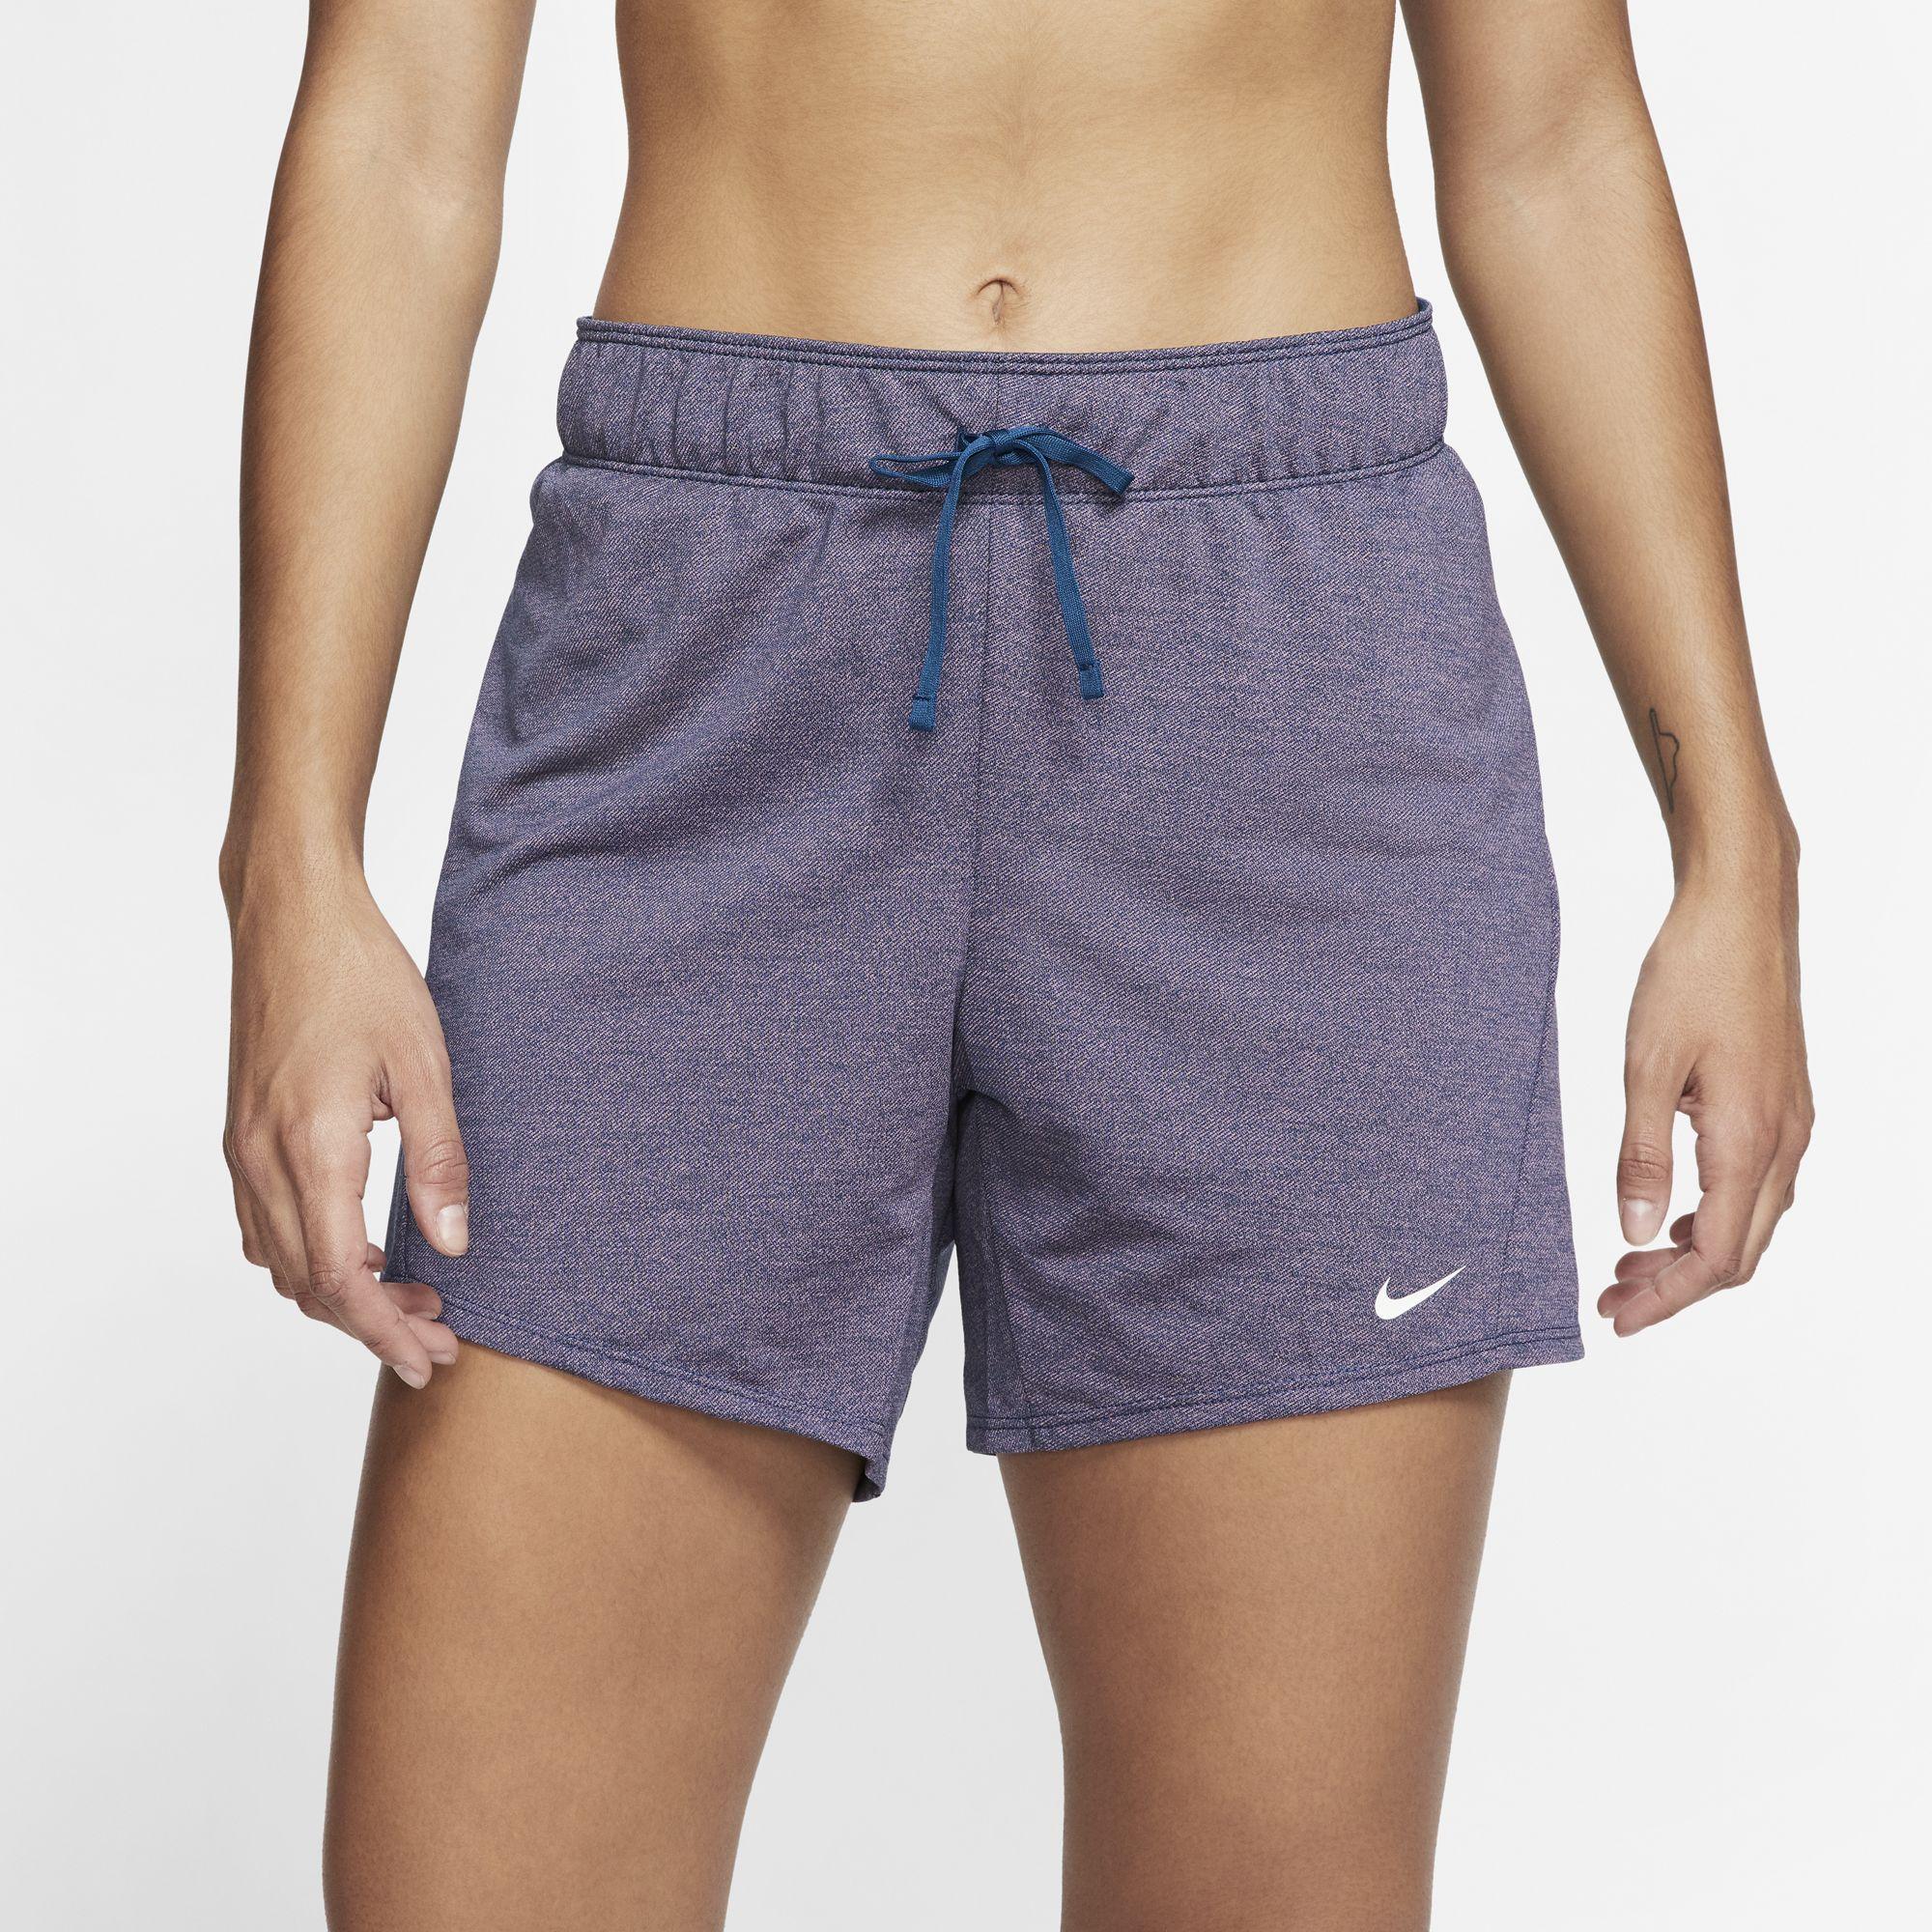 Women's Training Shorts, Navy, swatch